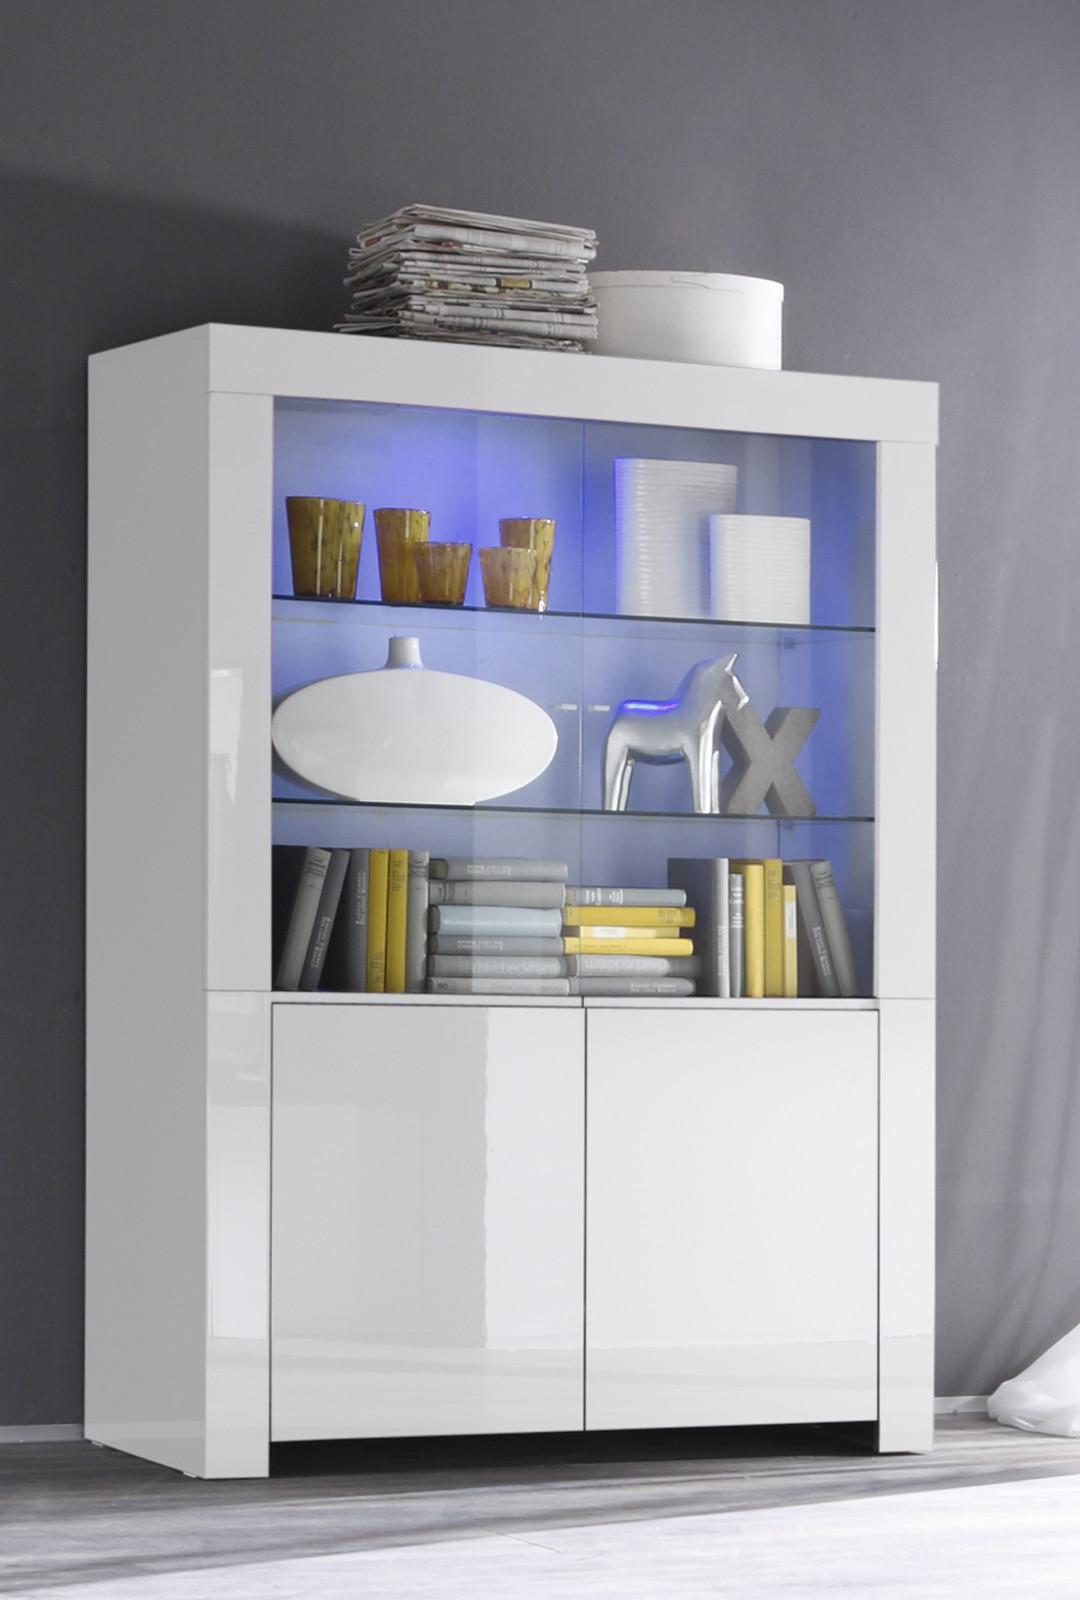 vitrine in wei hochglanz lack italien livorno. Black Bedroom Furniture Sets. Home Design Ideas